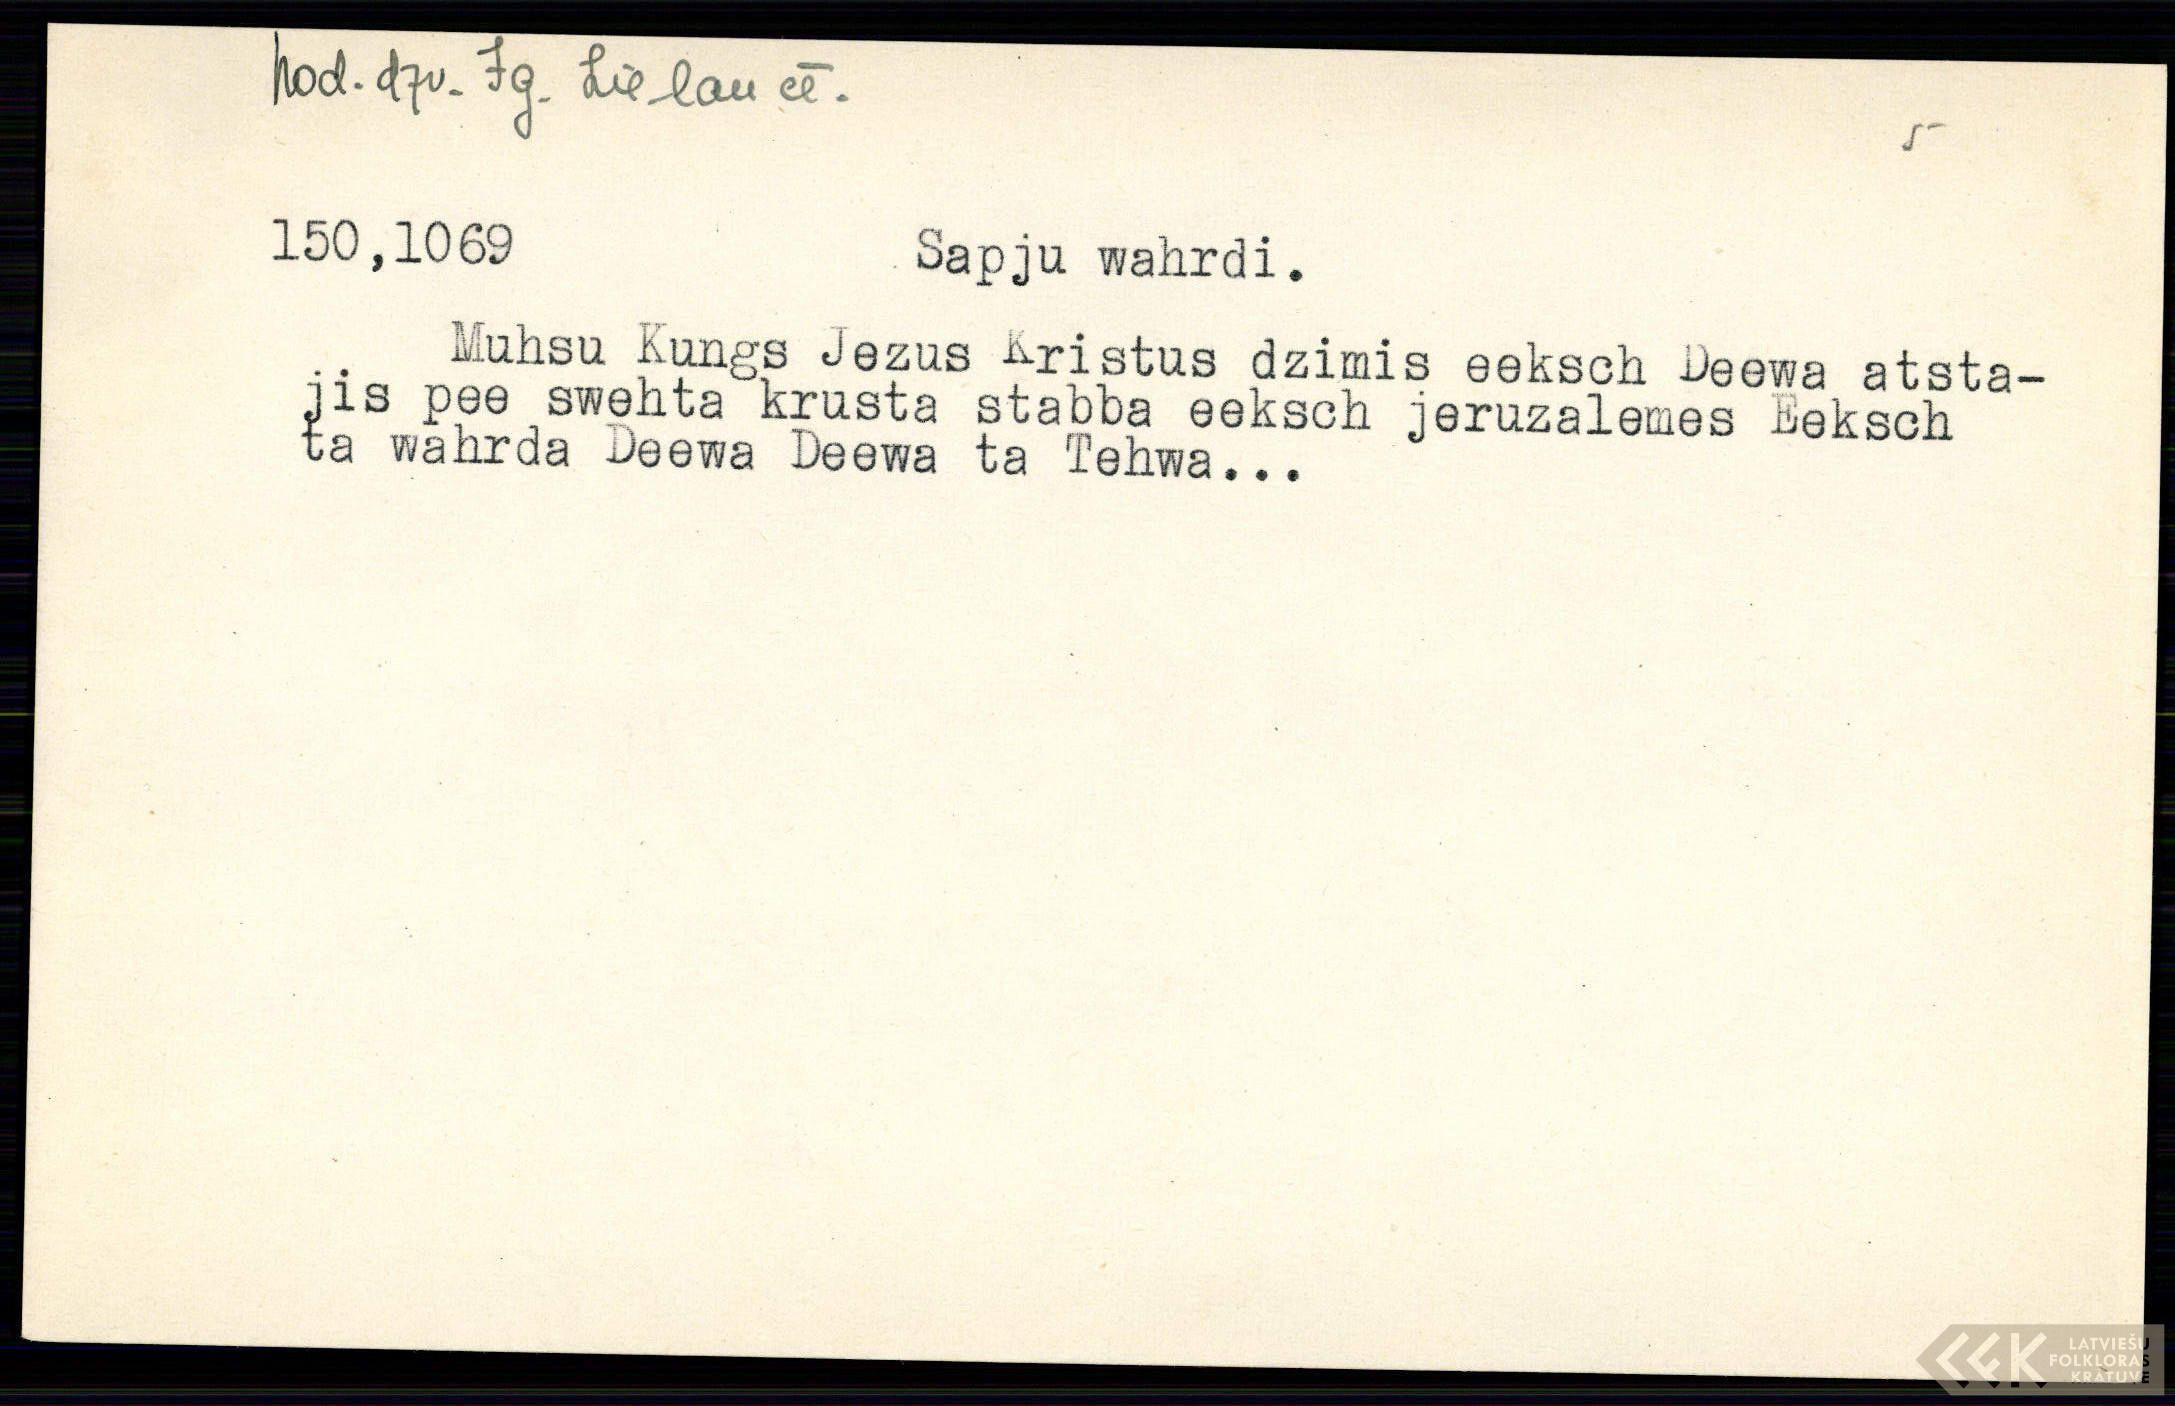 LFK-0150-01069-buramvardu-kartoteka